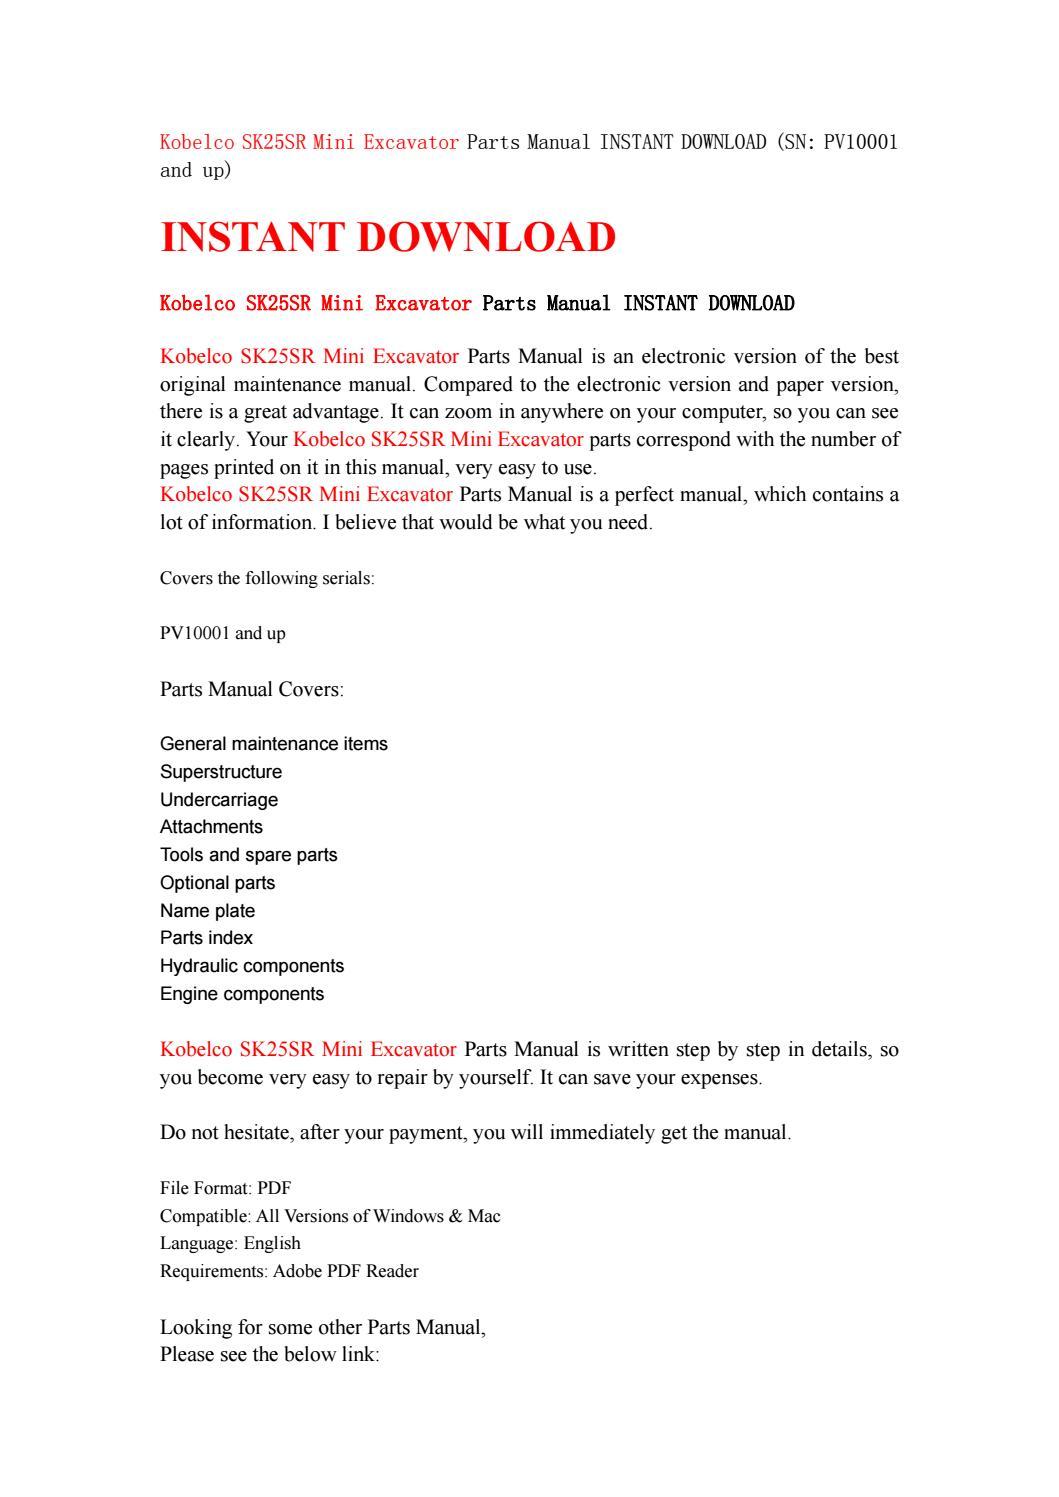 Kobelco sk25sr mini excavator parts manual instant download (sn pv10001 and  up) by kfjsjfnsef - issuu